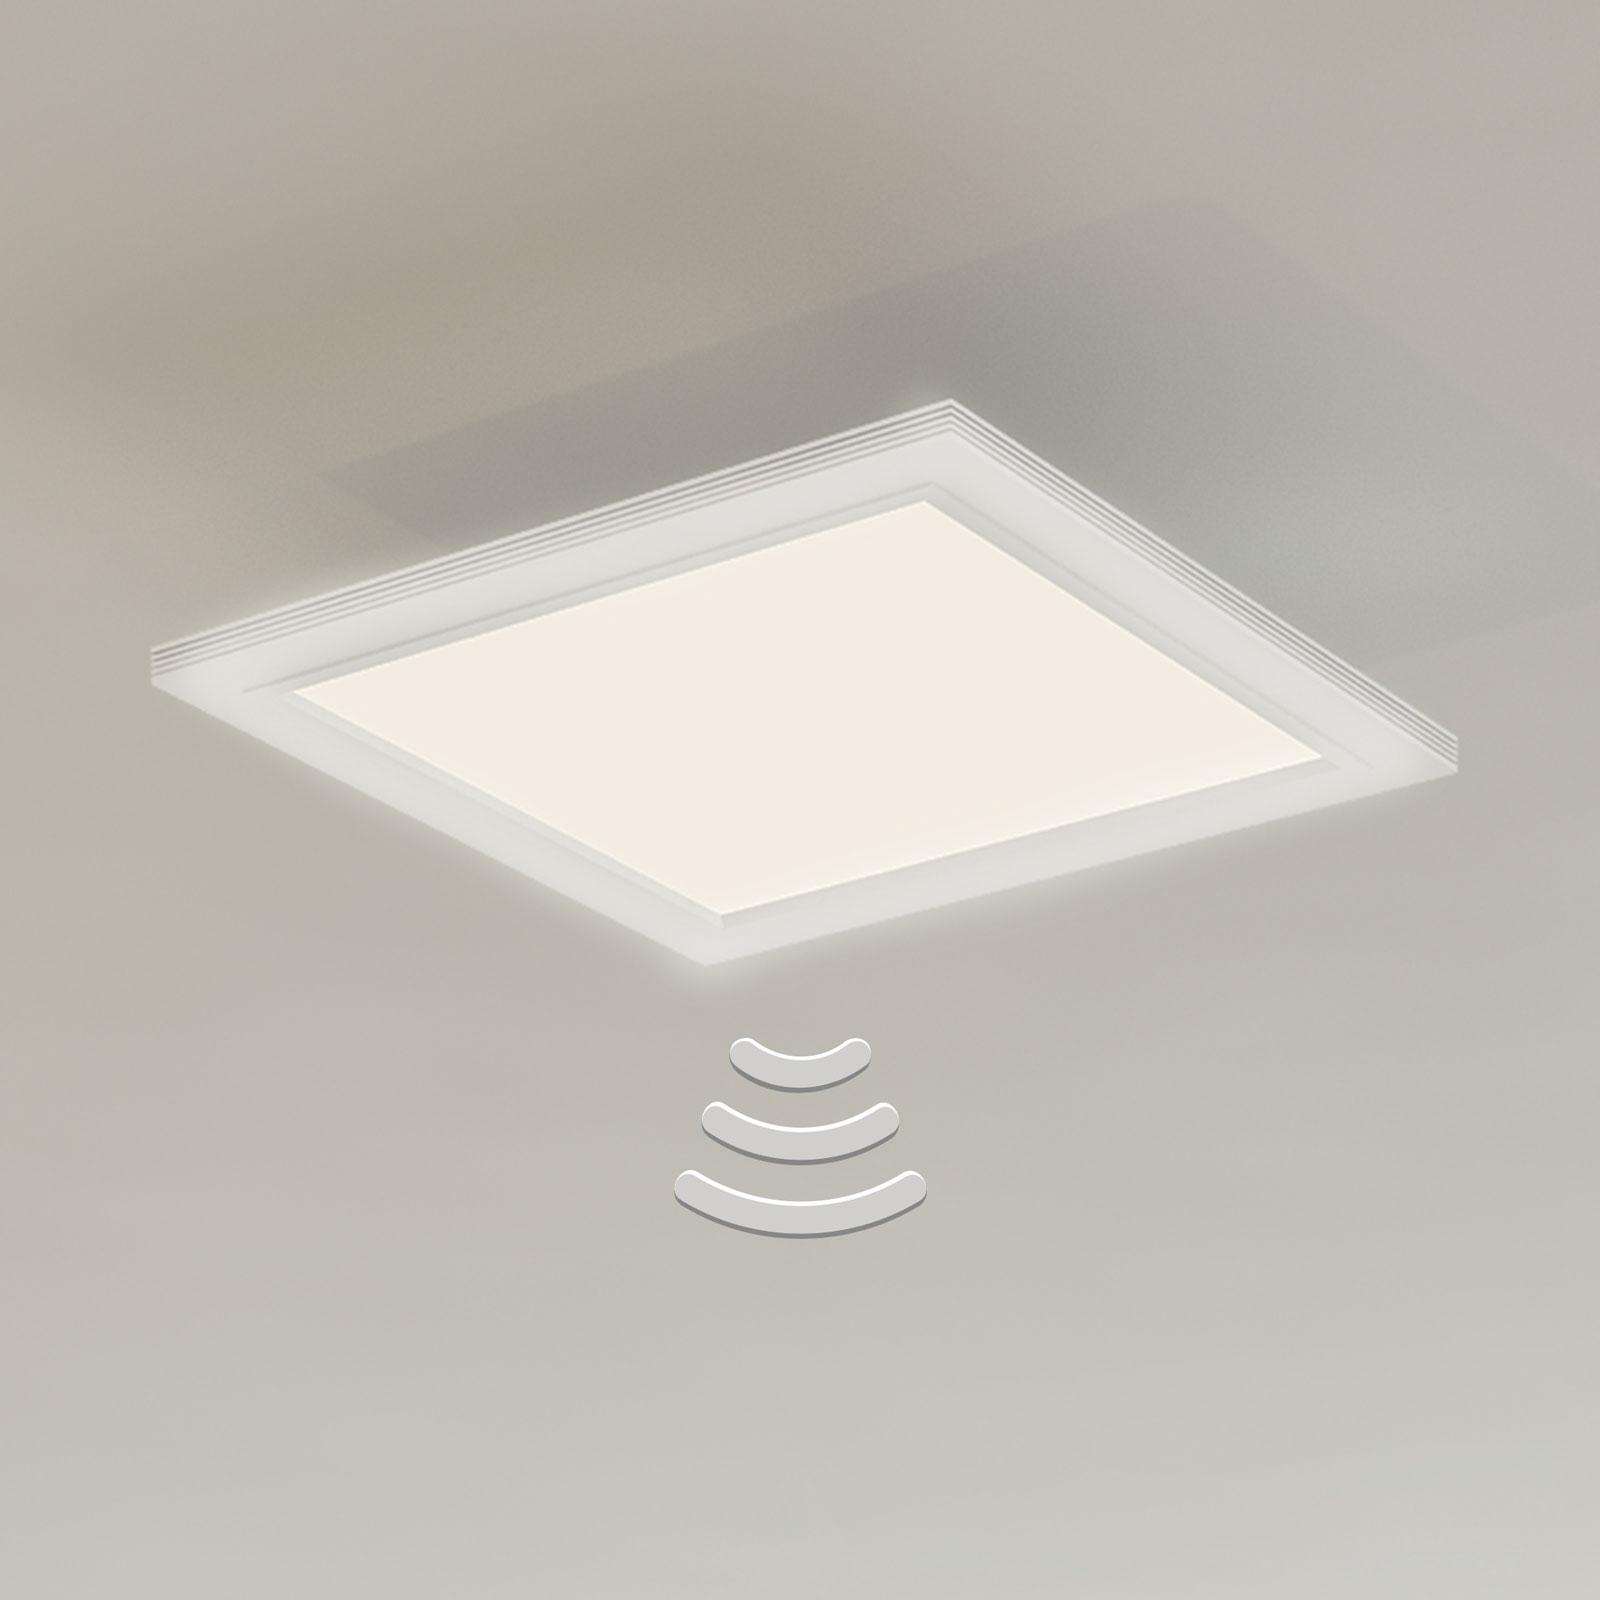 LED-Deckenlampe 7187-016 mit Sensor, 29,5x29,5cm